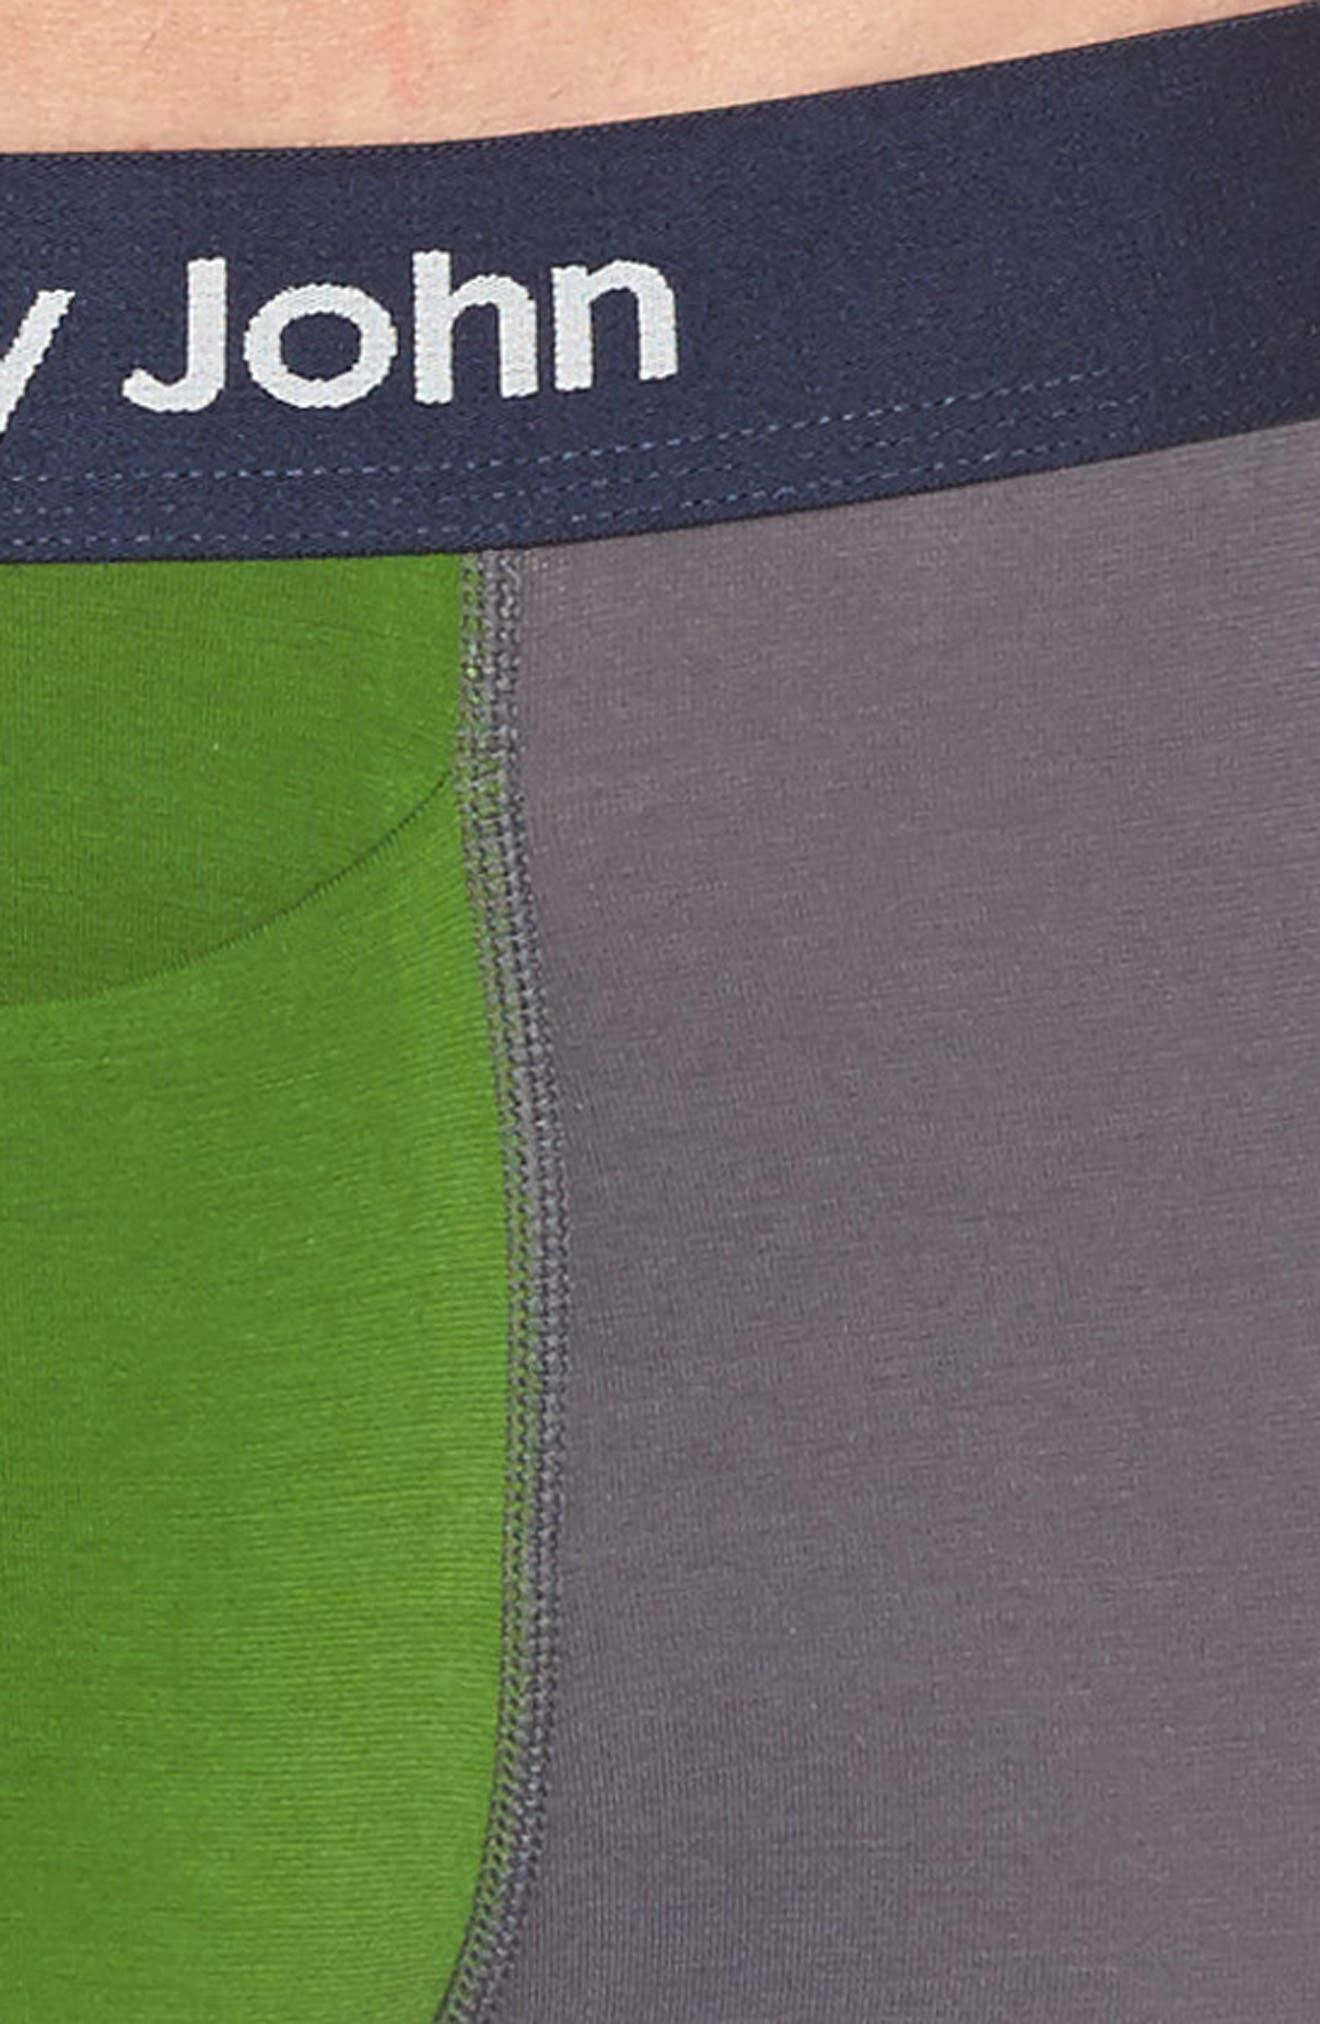 Cool Cotton Blend Trunks,                             Alternate thumbnail 4, color,                             094